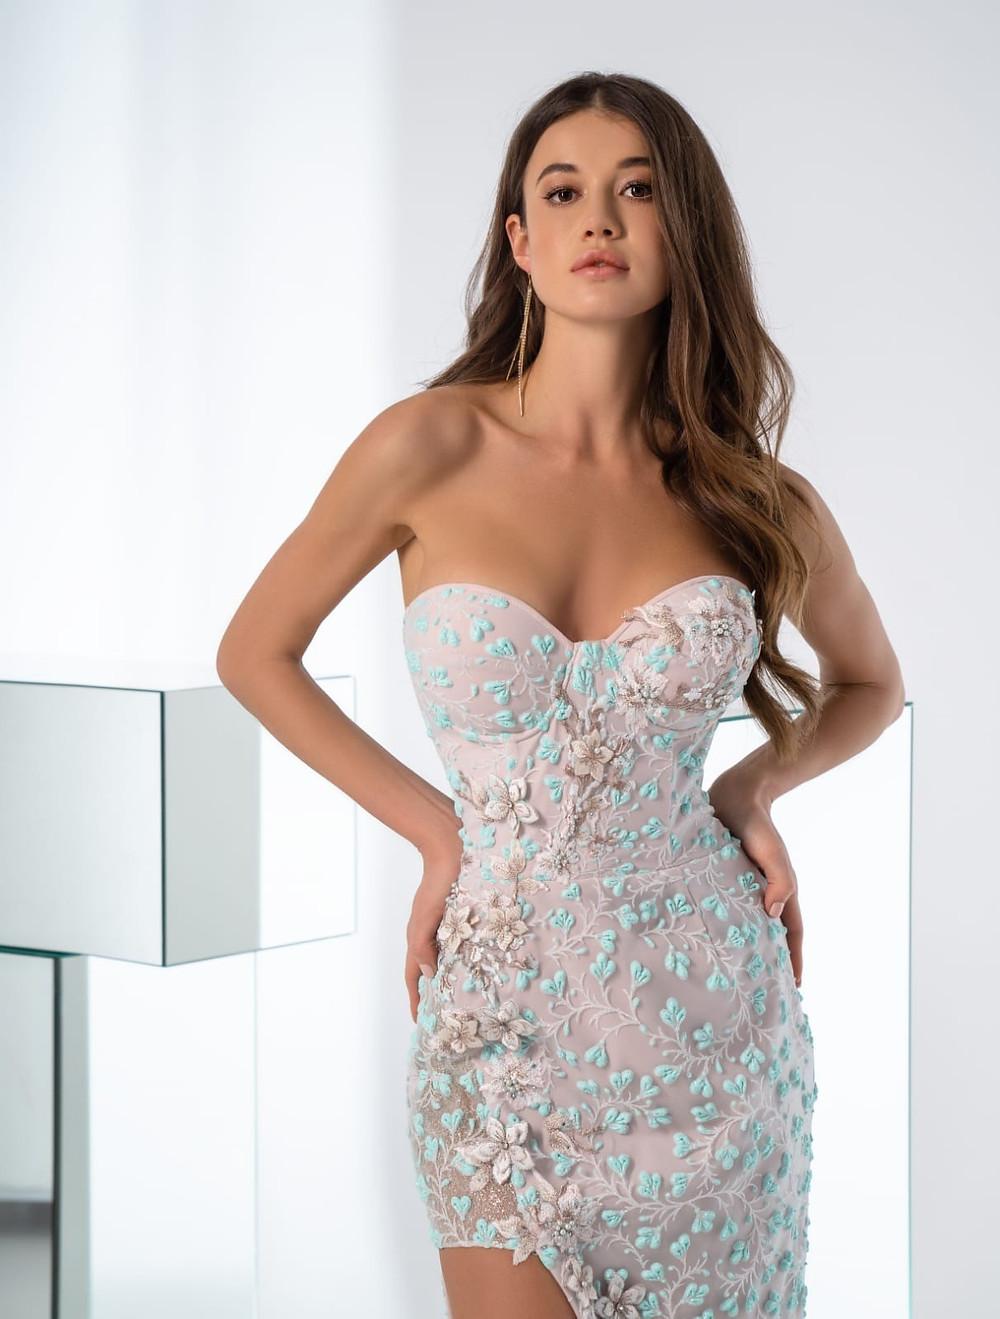 rochii de seara, rochii de ocazie, rochii de nunta, rochii nasa